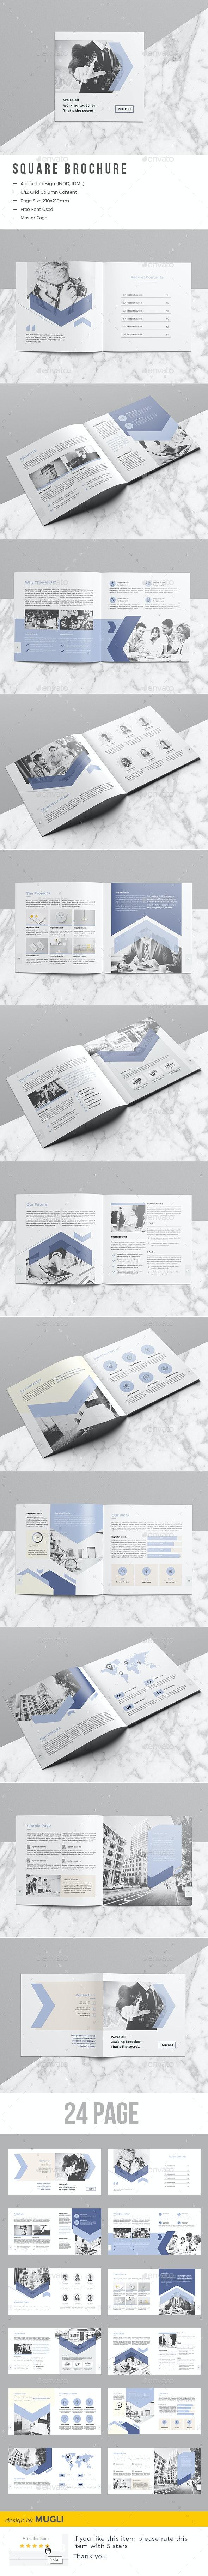 Company Square Brochure - Corporate Brochures